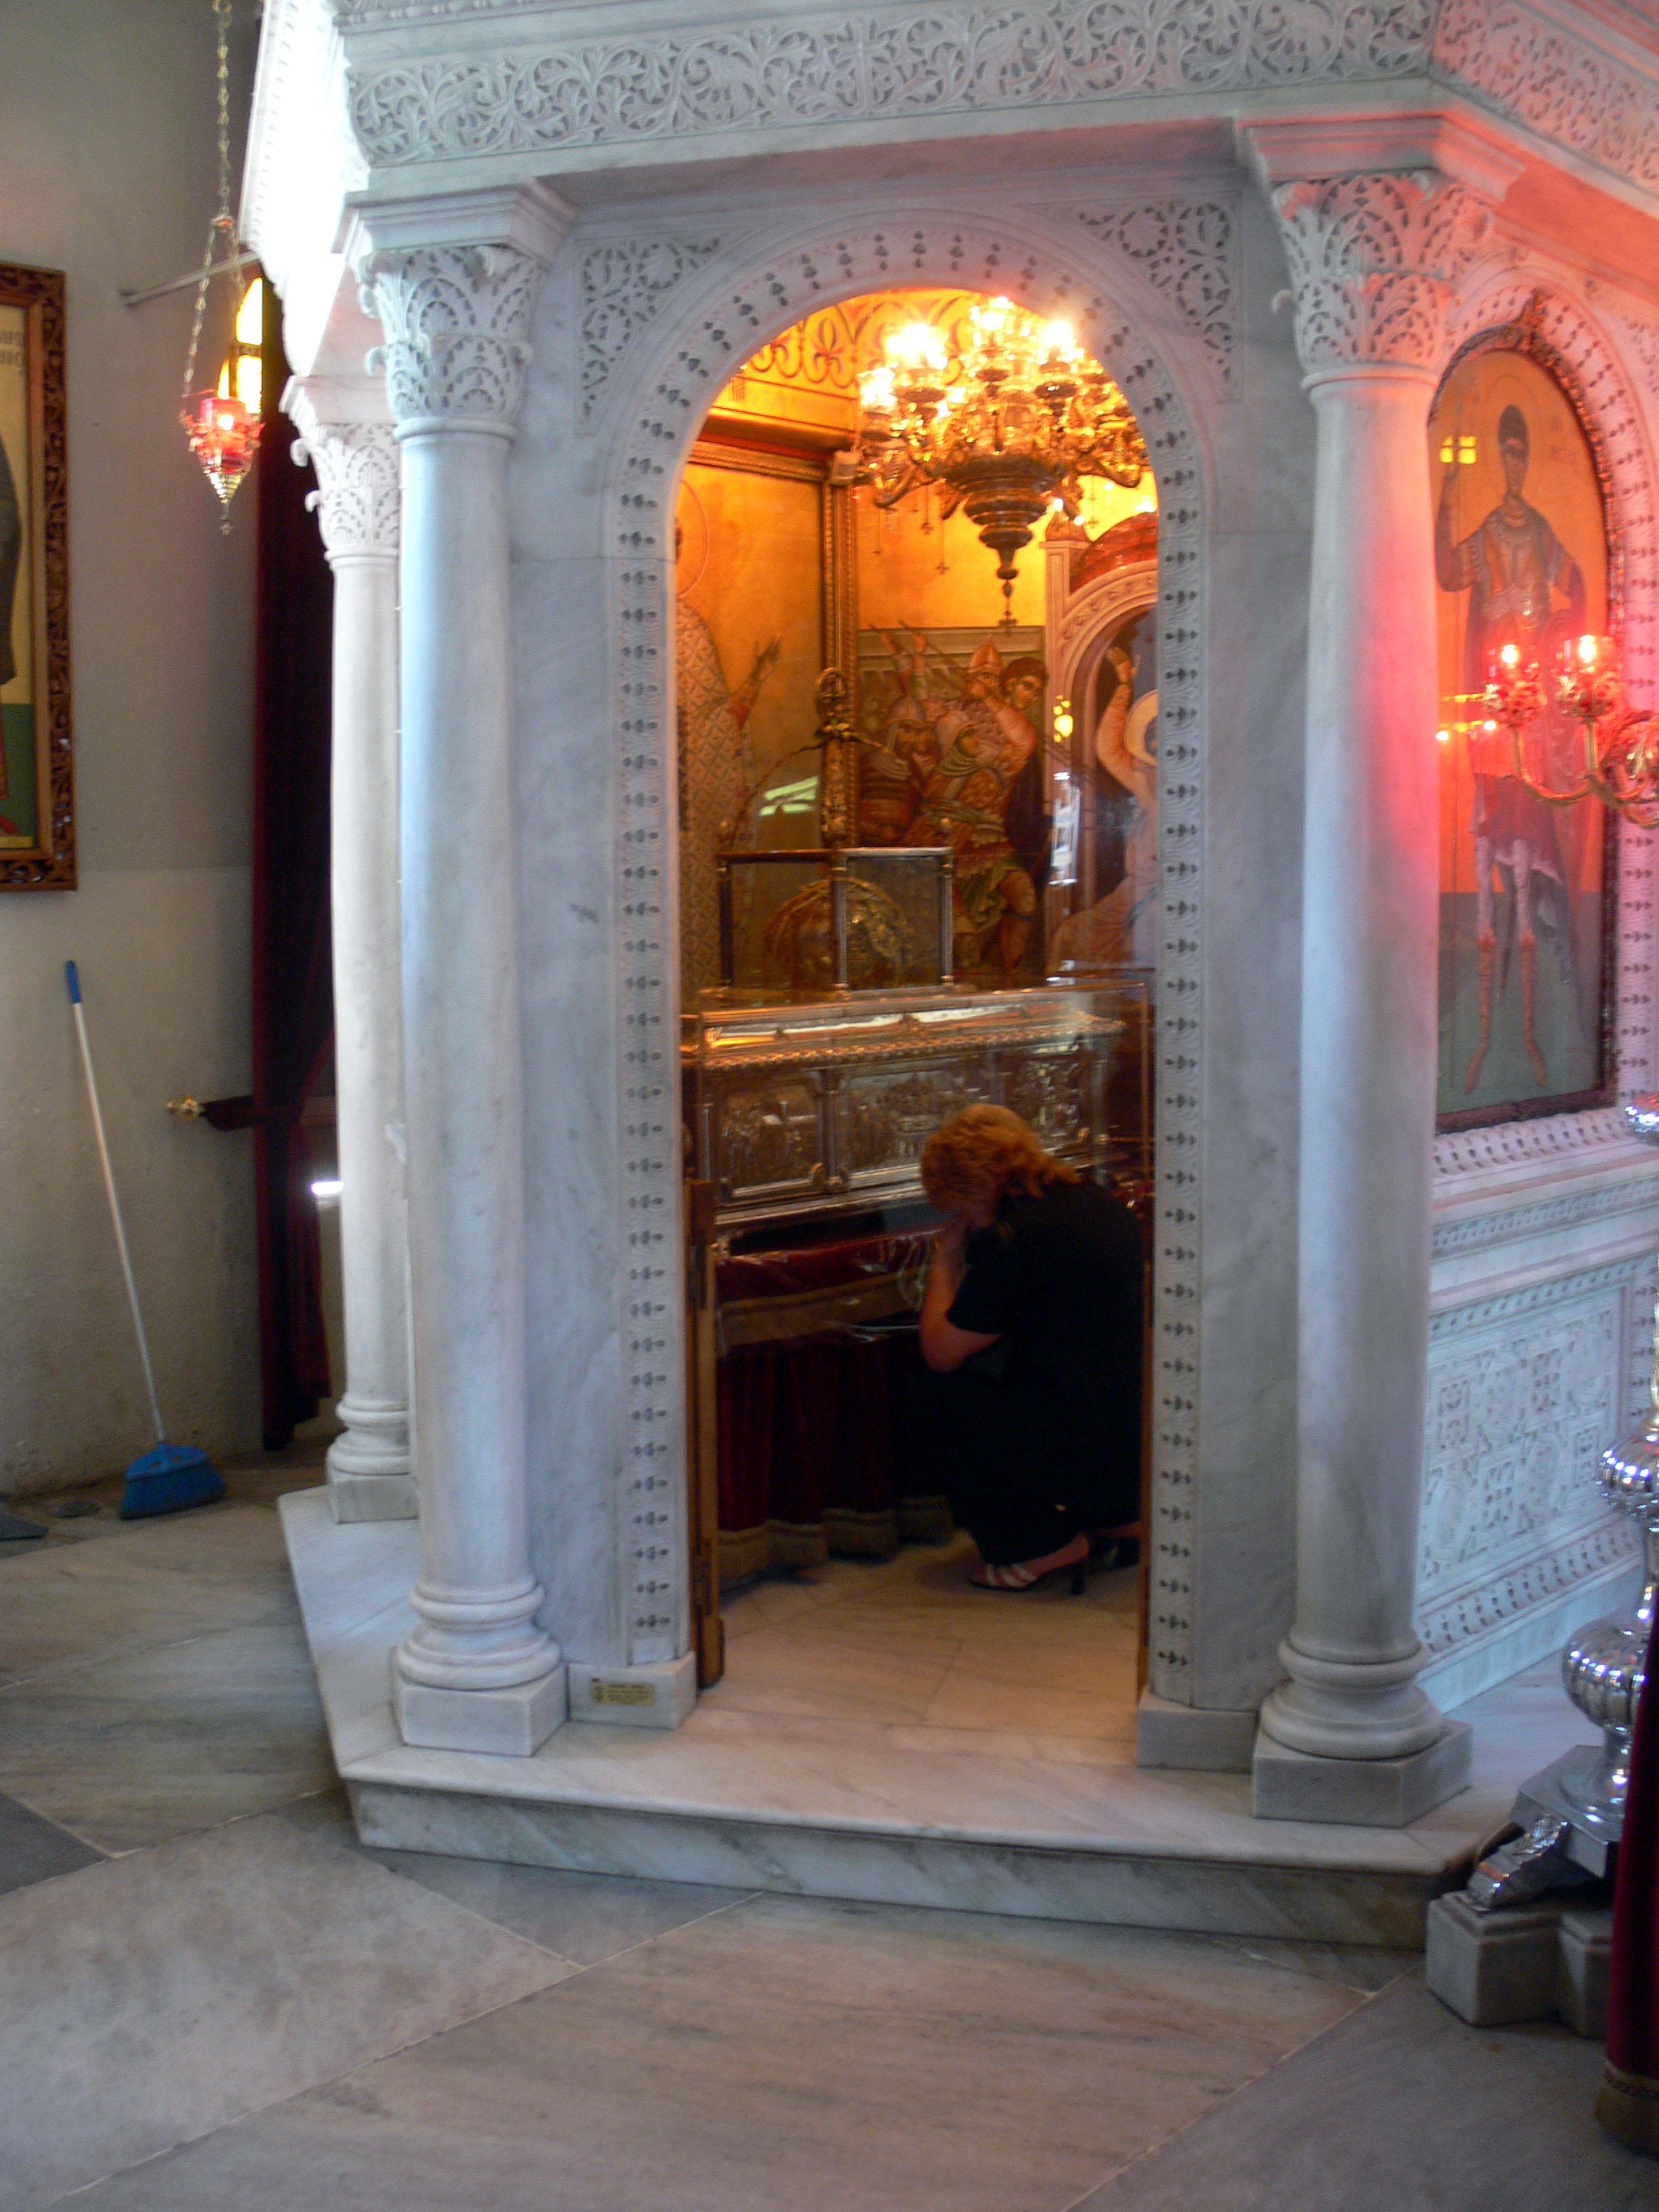 La Sfantul Dimitrie: stingea lumanarile si le fura imediat dupa ce le aprindea omul